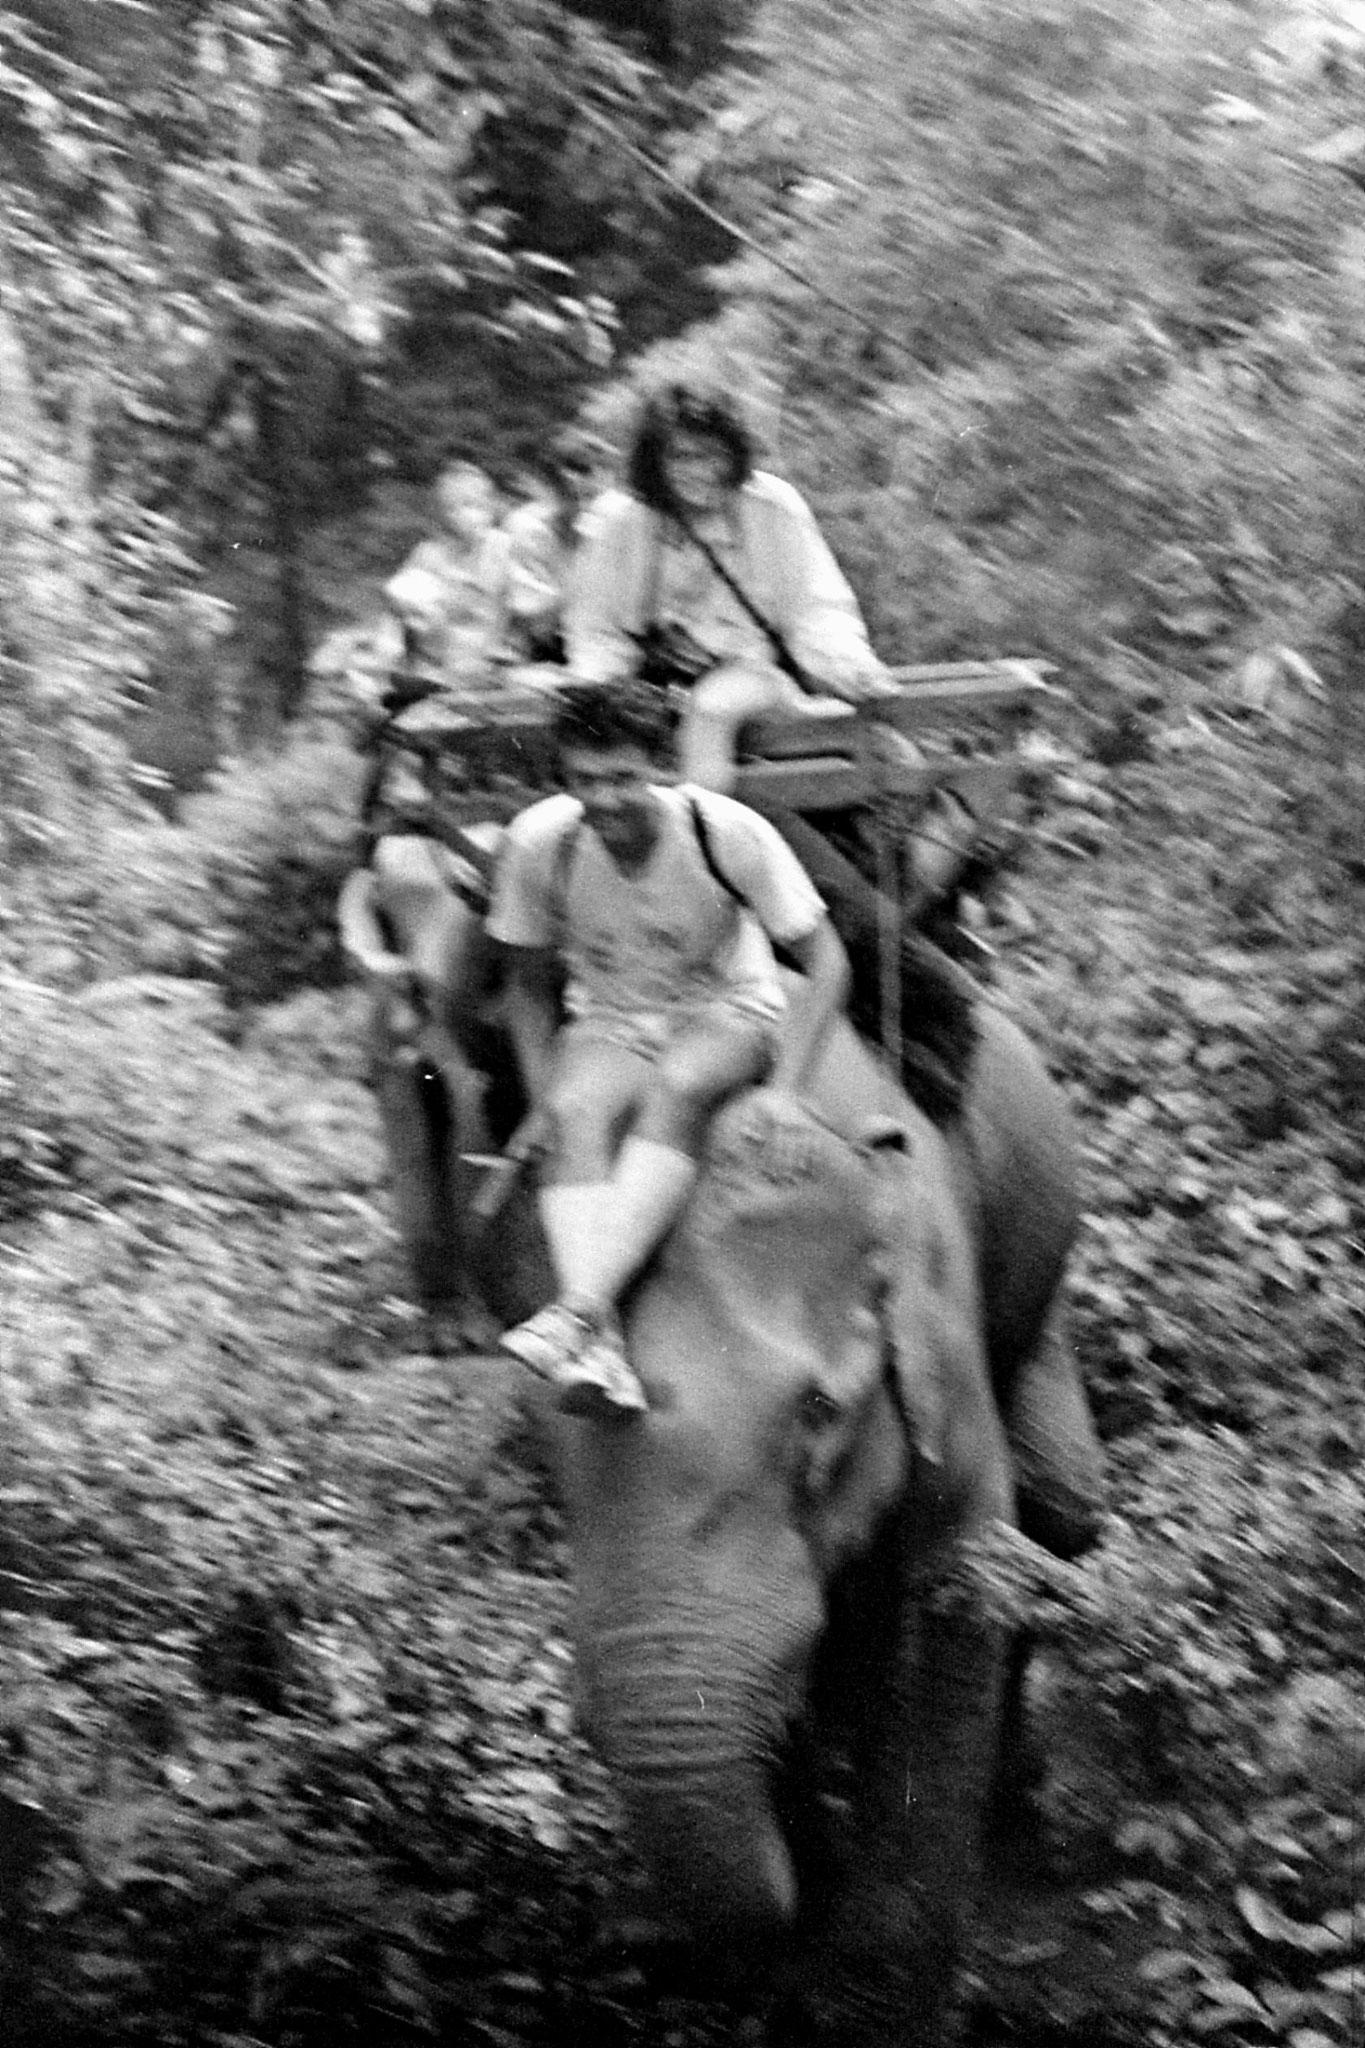 13/6/1990: 25: Last day of Trek, on elephant